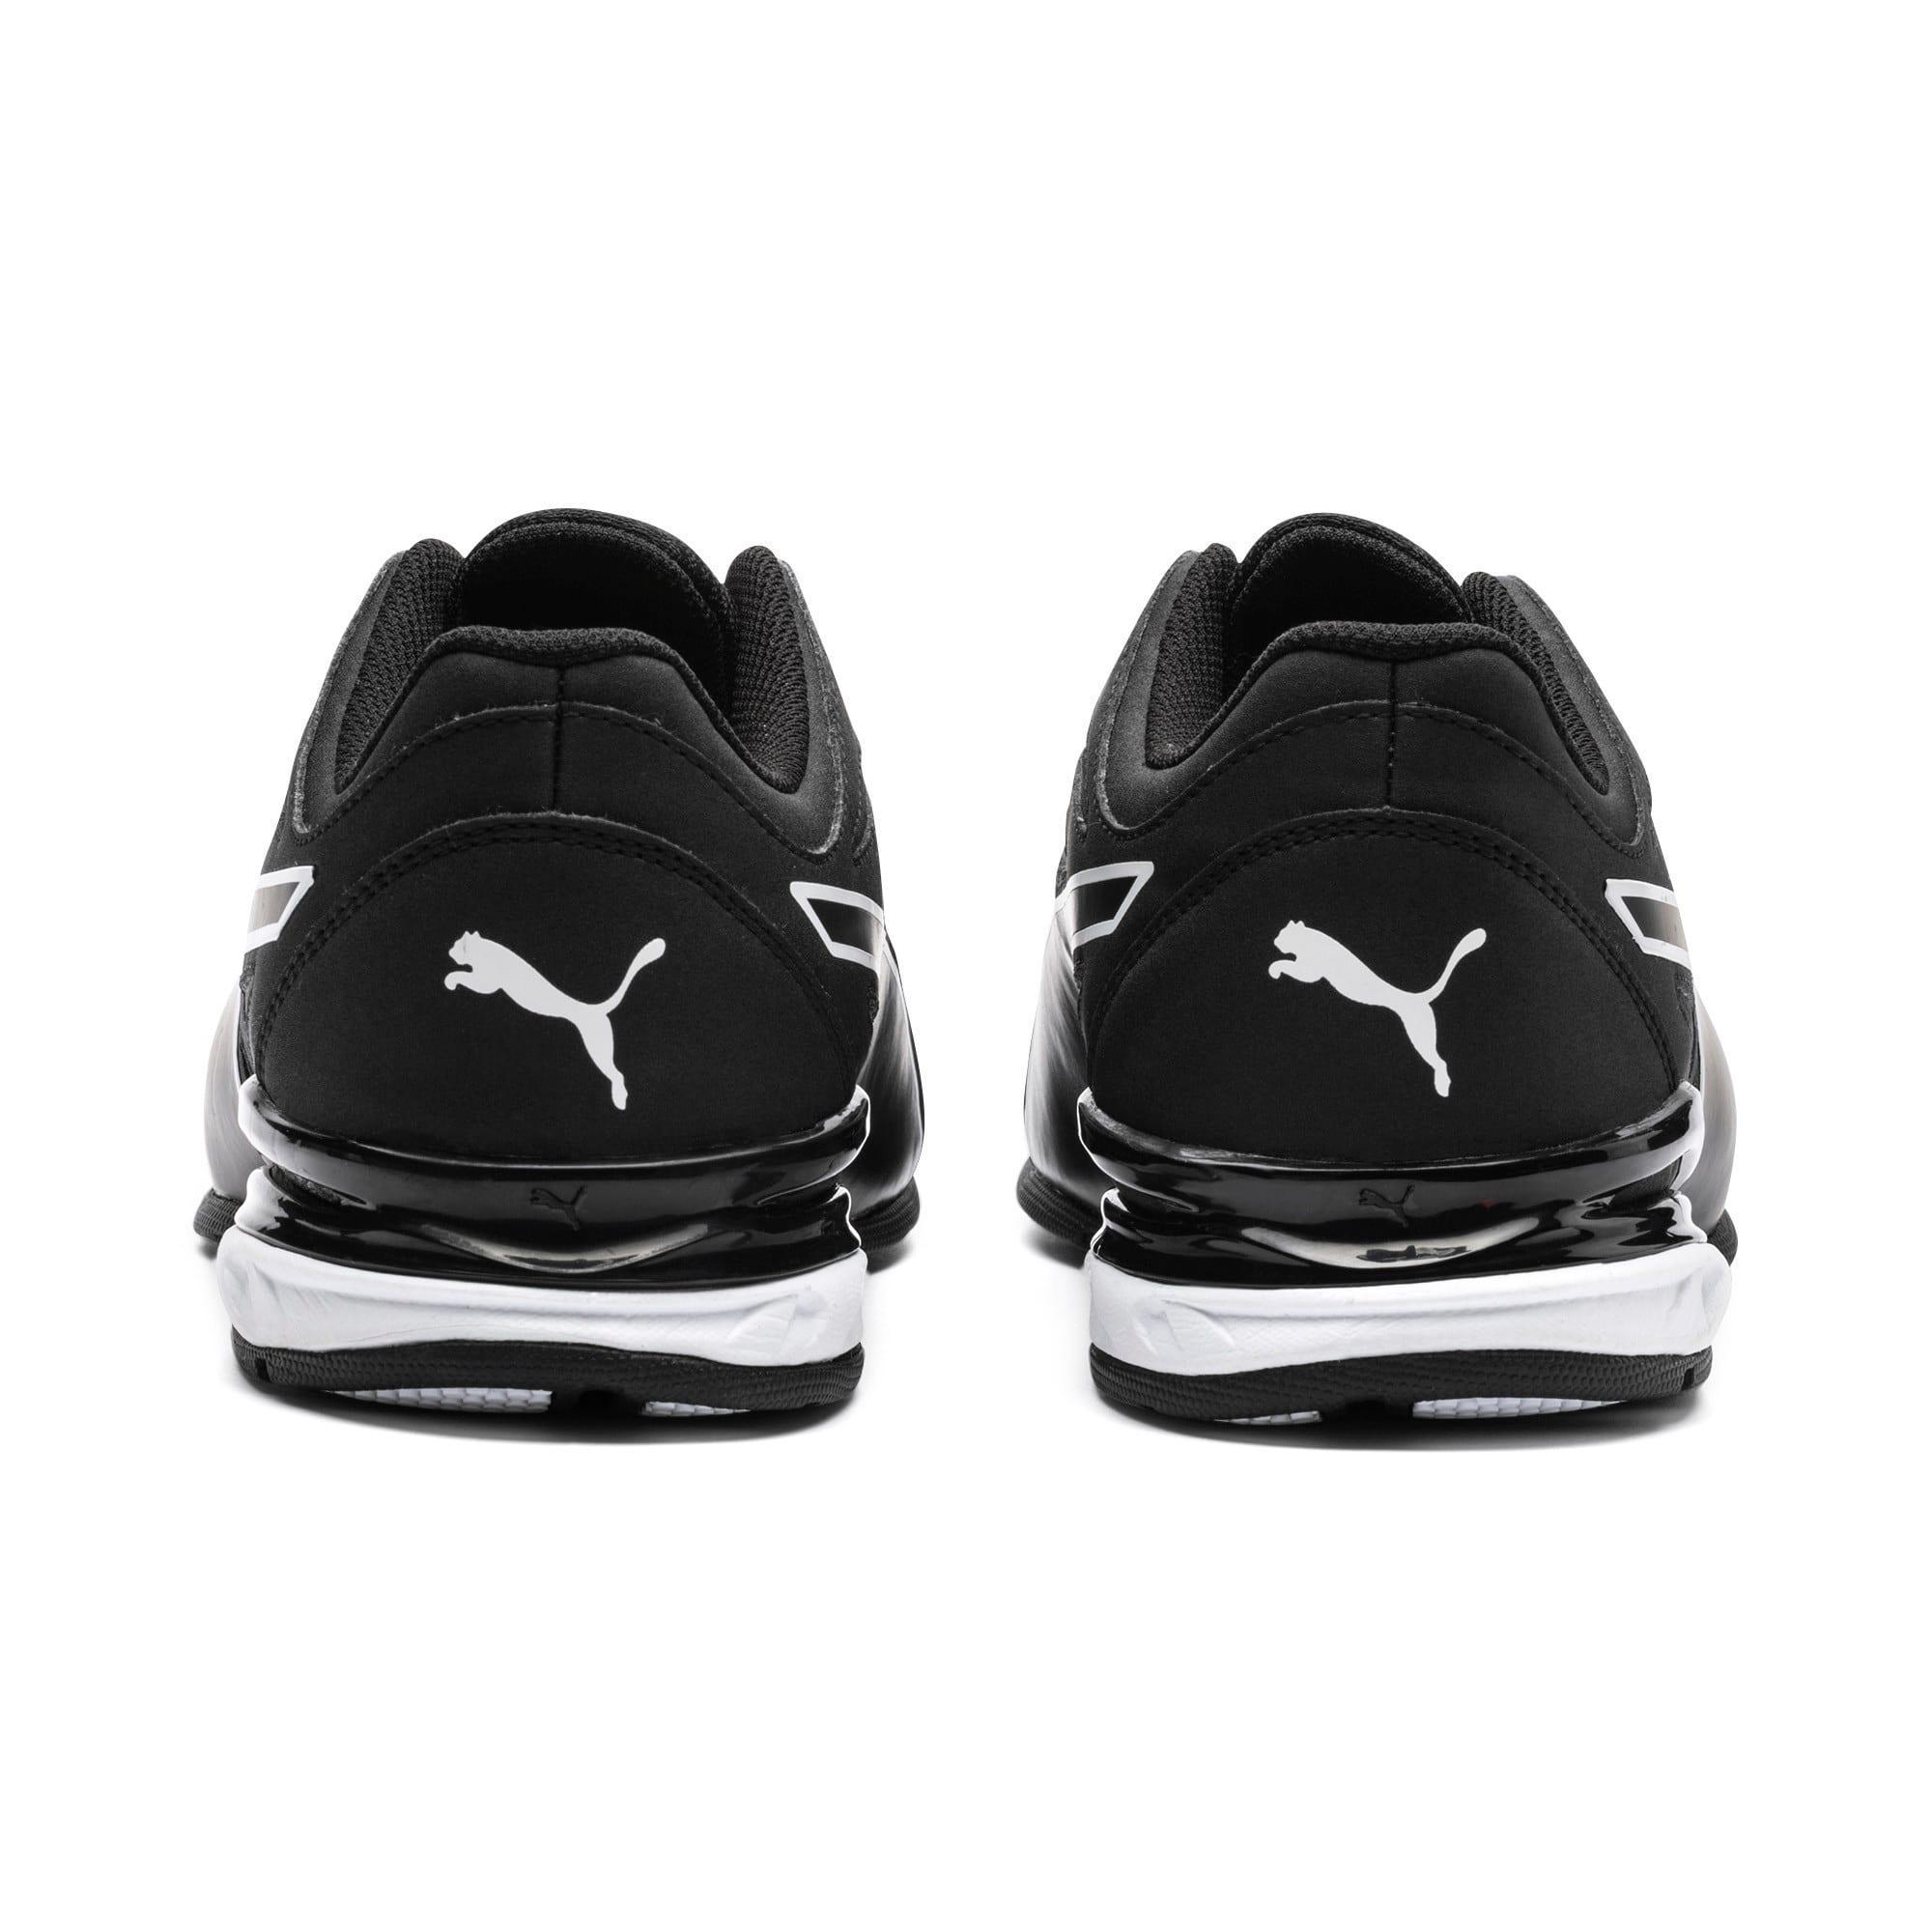 Thumbnail 4 of Tazon Modern SL Men's Running Shoes, Puma Black-Puma White, medium-IND